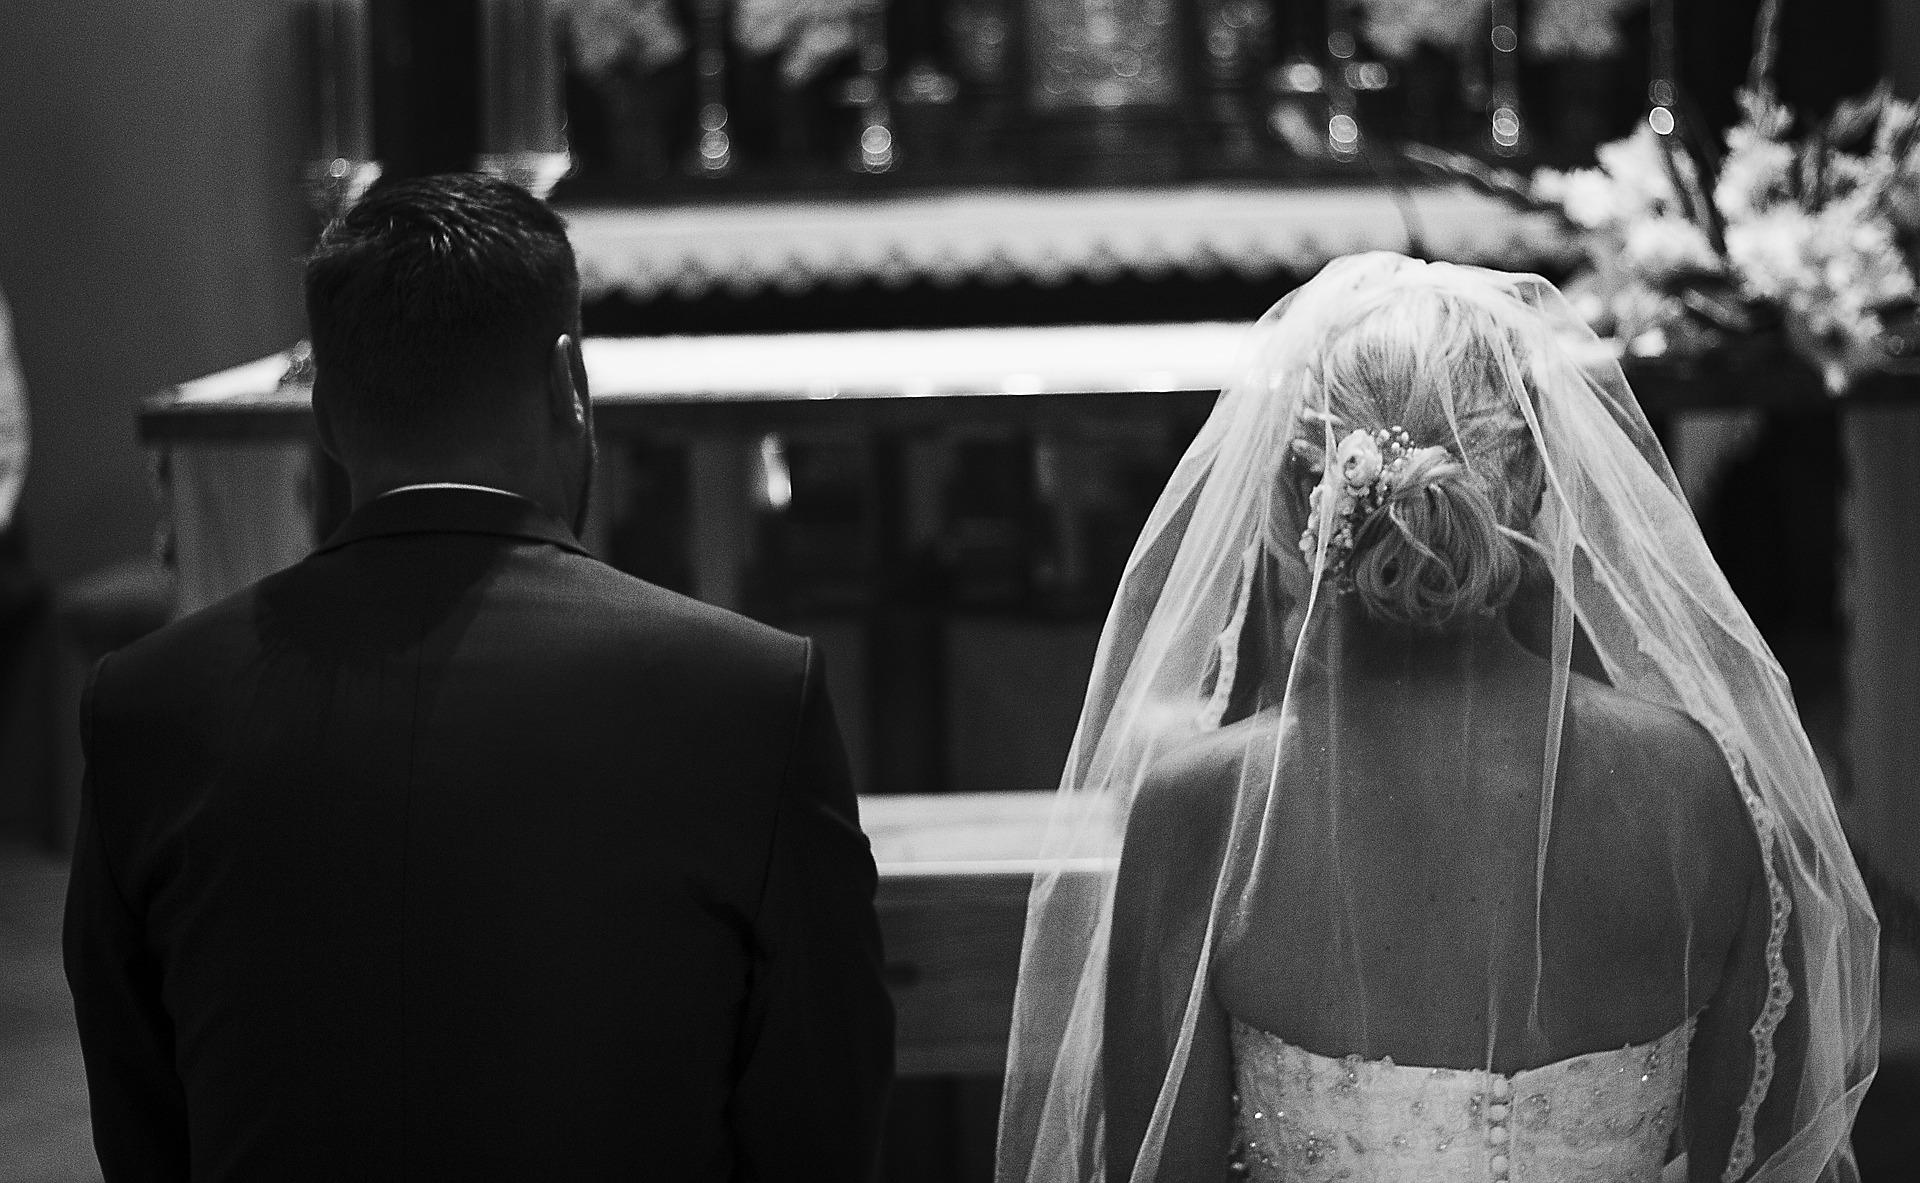 Vintage Weddings at lower costs